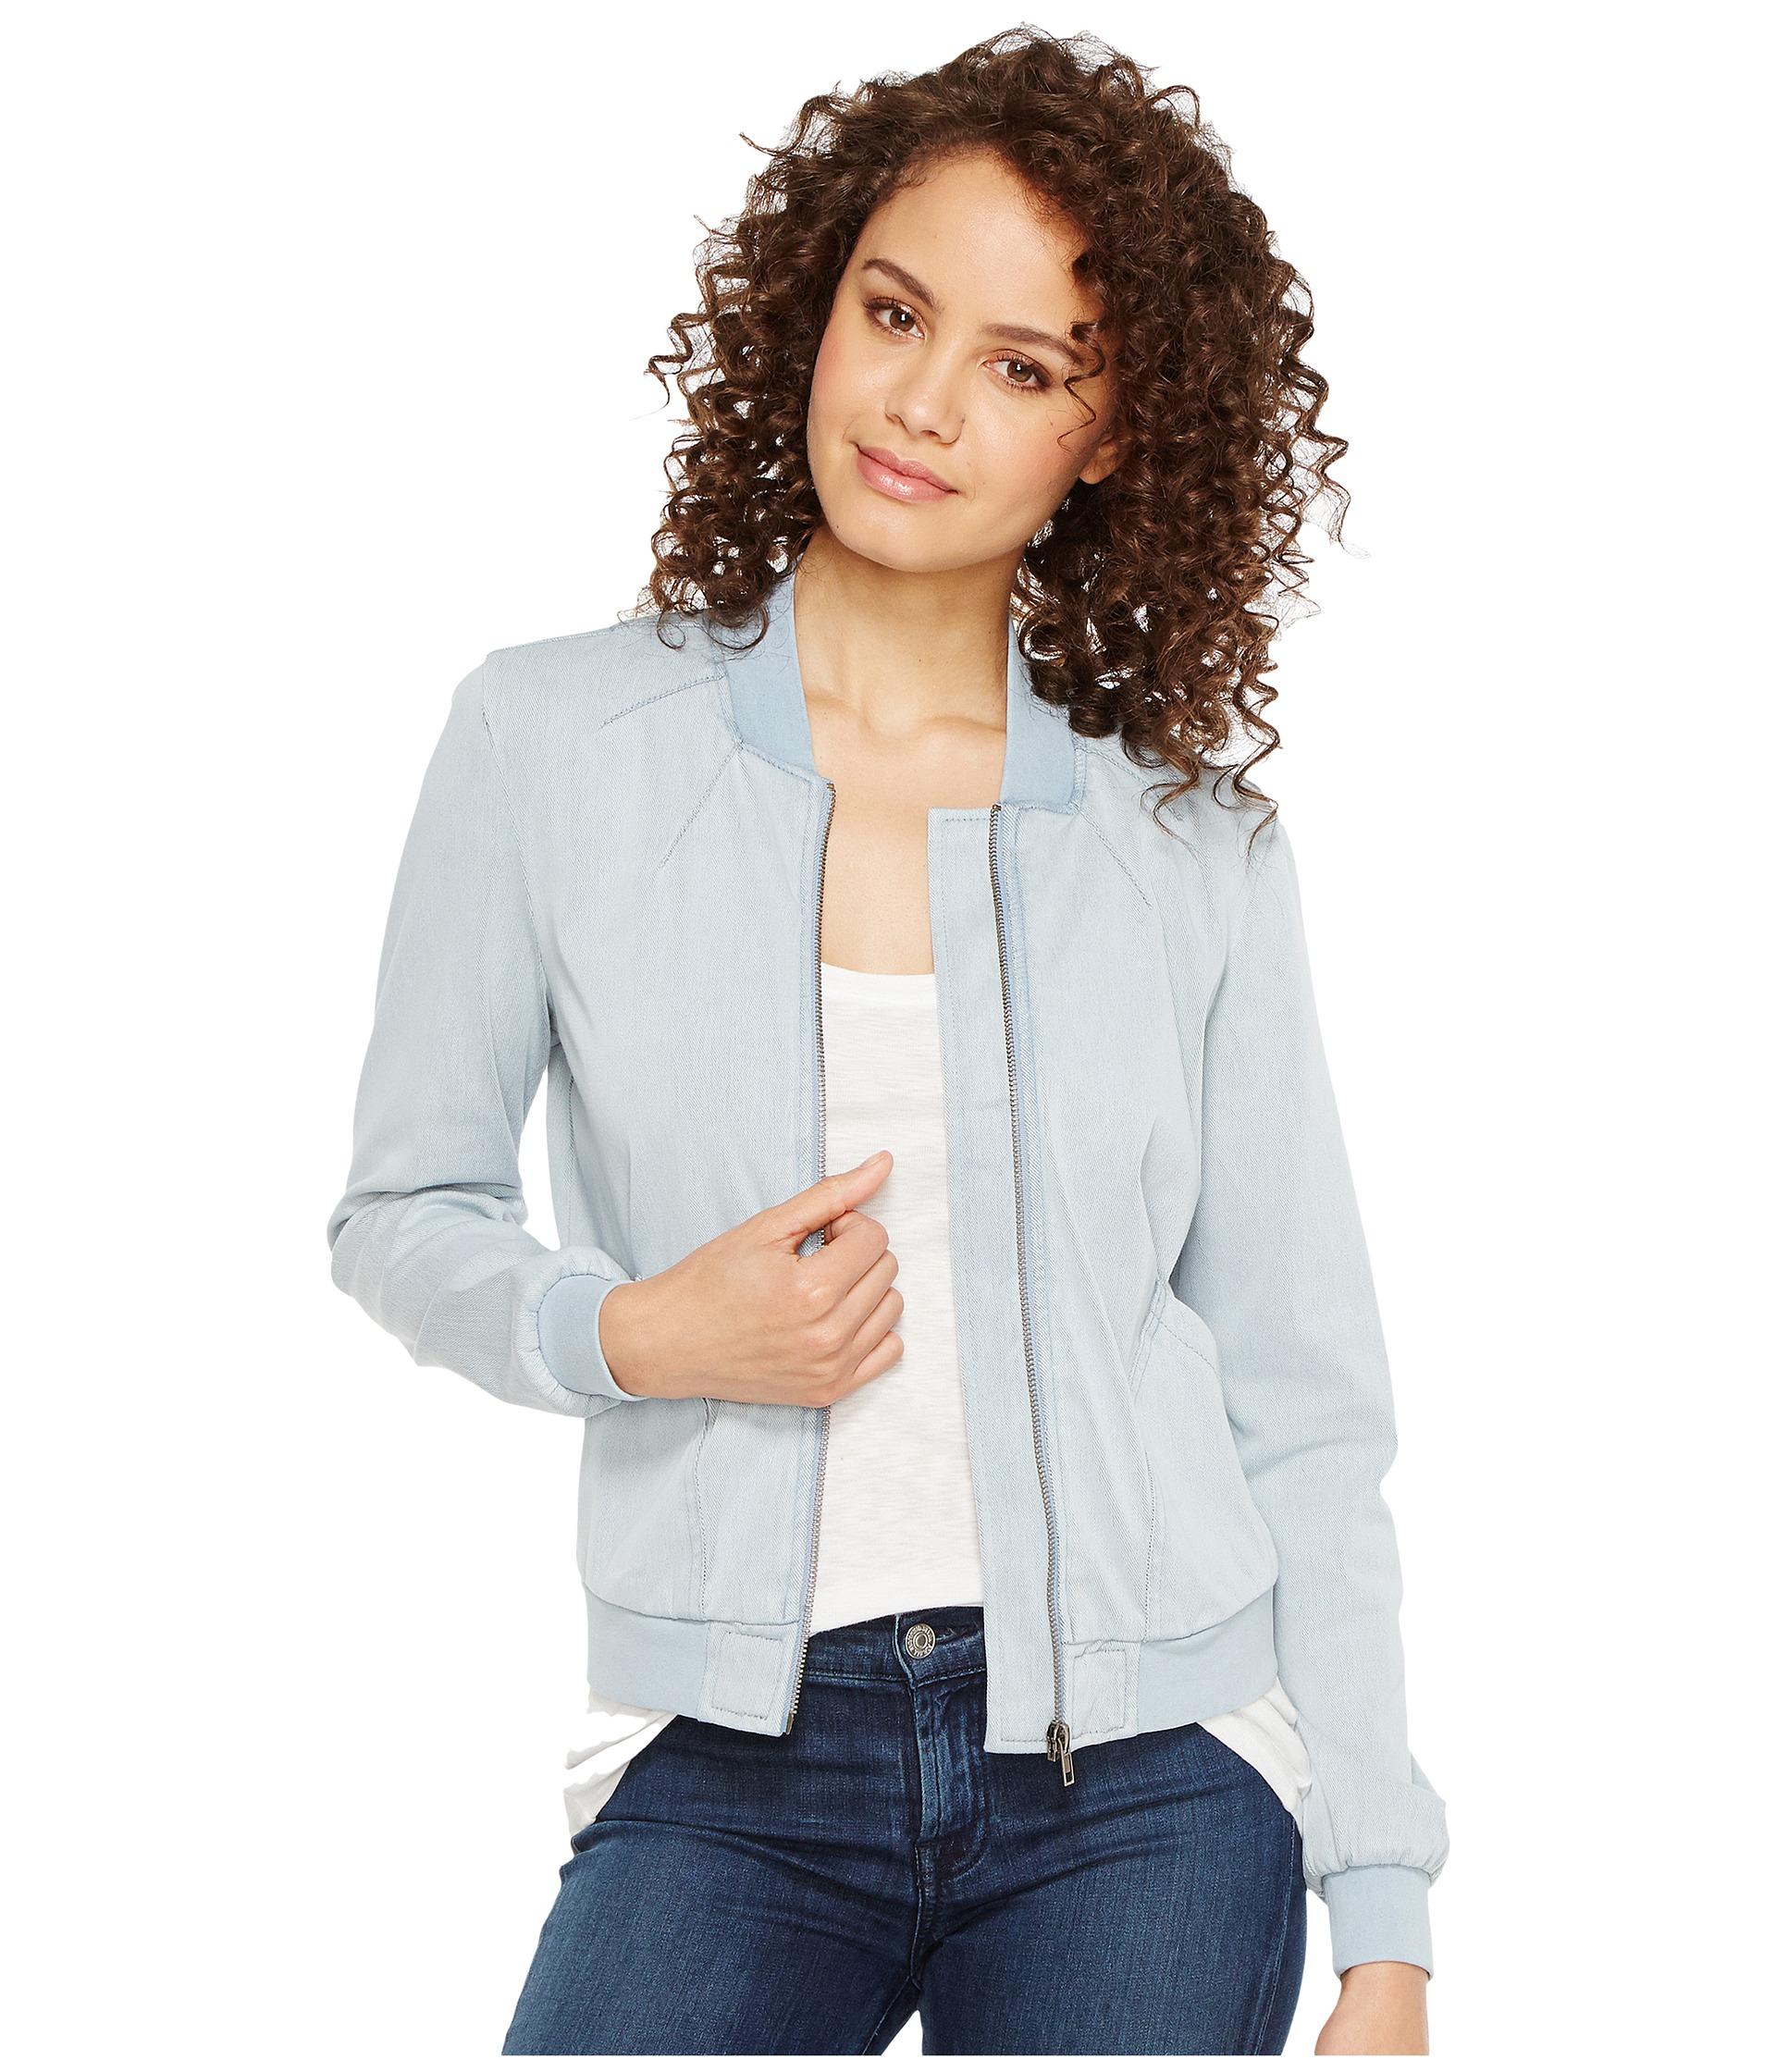 Liverpool bomber jacket in powerflex knit denim at for Schoolboy q girl power shirt